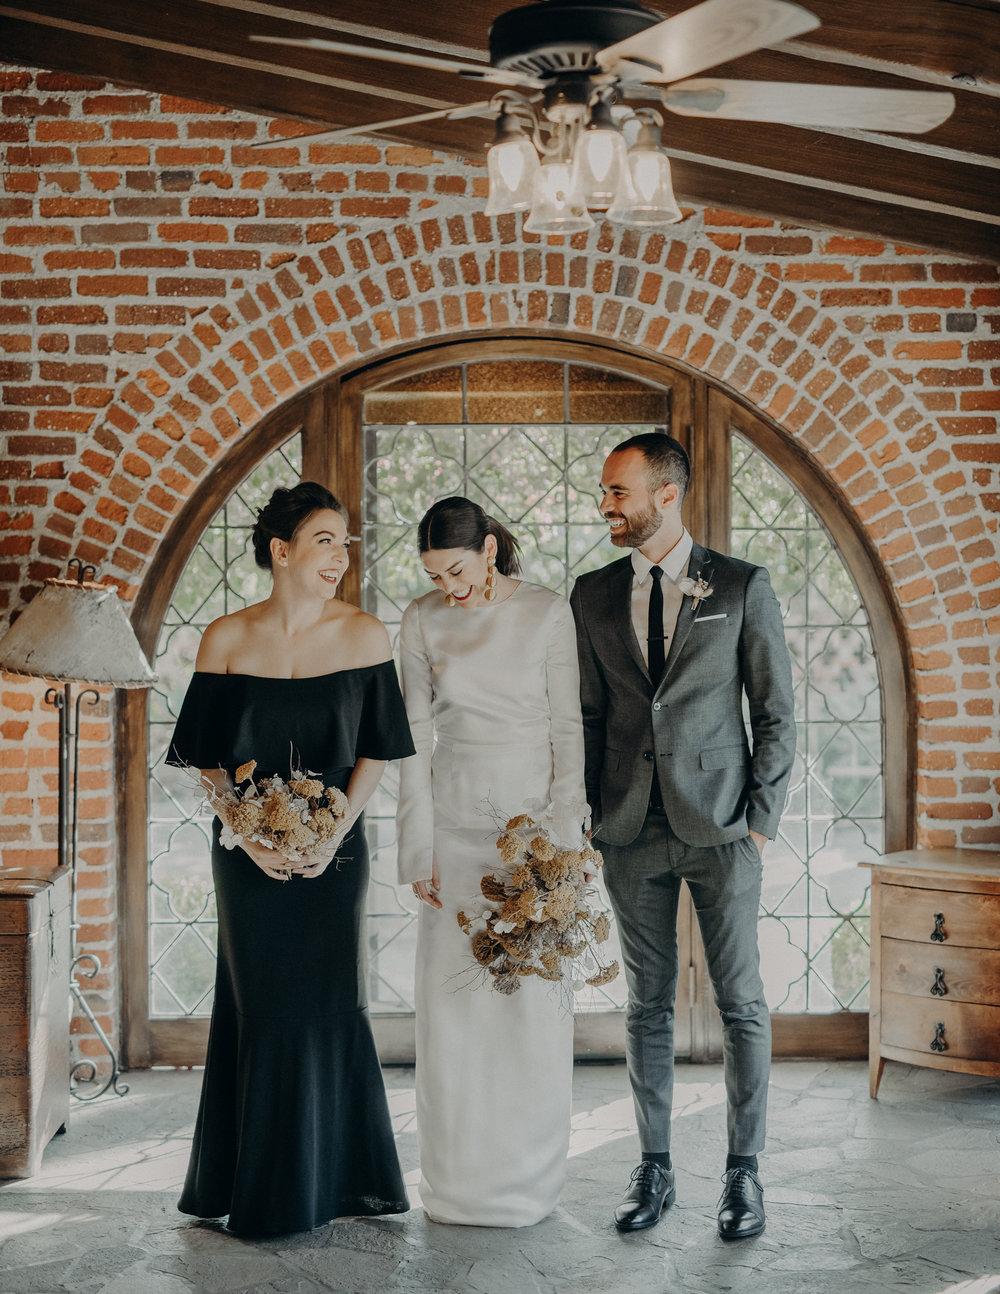 Hummingbird Nest Ranch Wedding - Wedding Photographer in Los Angeles - IsaiahAndTaylor.com-031.jpg